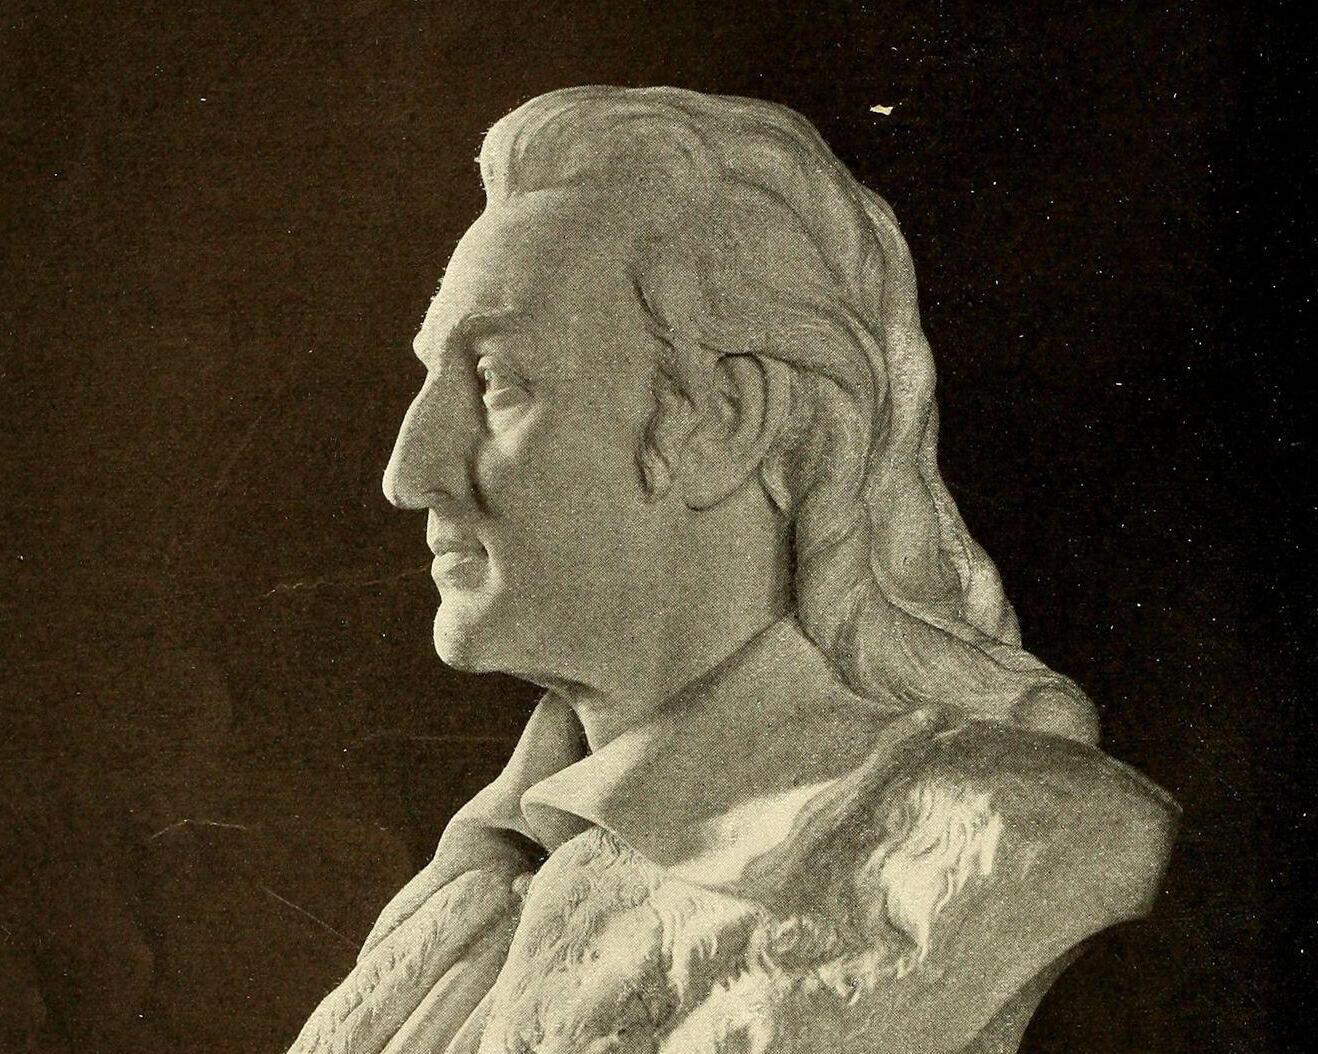 John James Audubon bust by William Couper. Reading Room 2020/Alamy